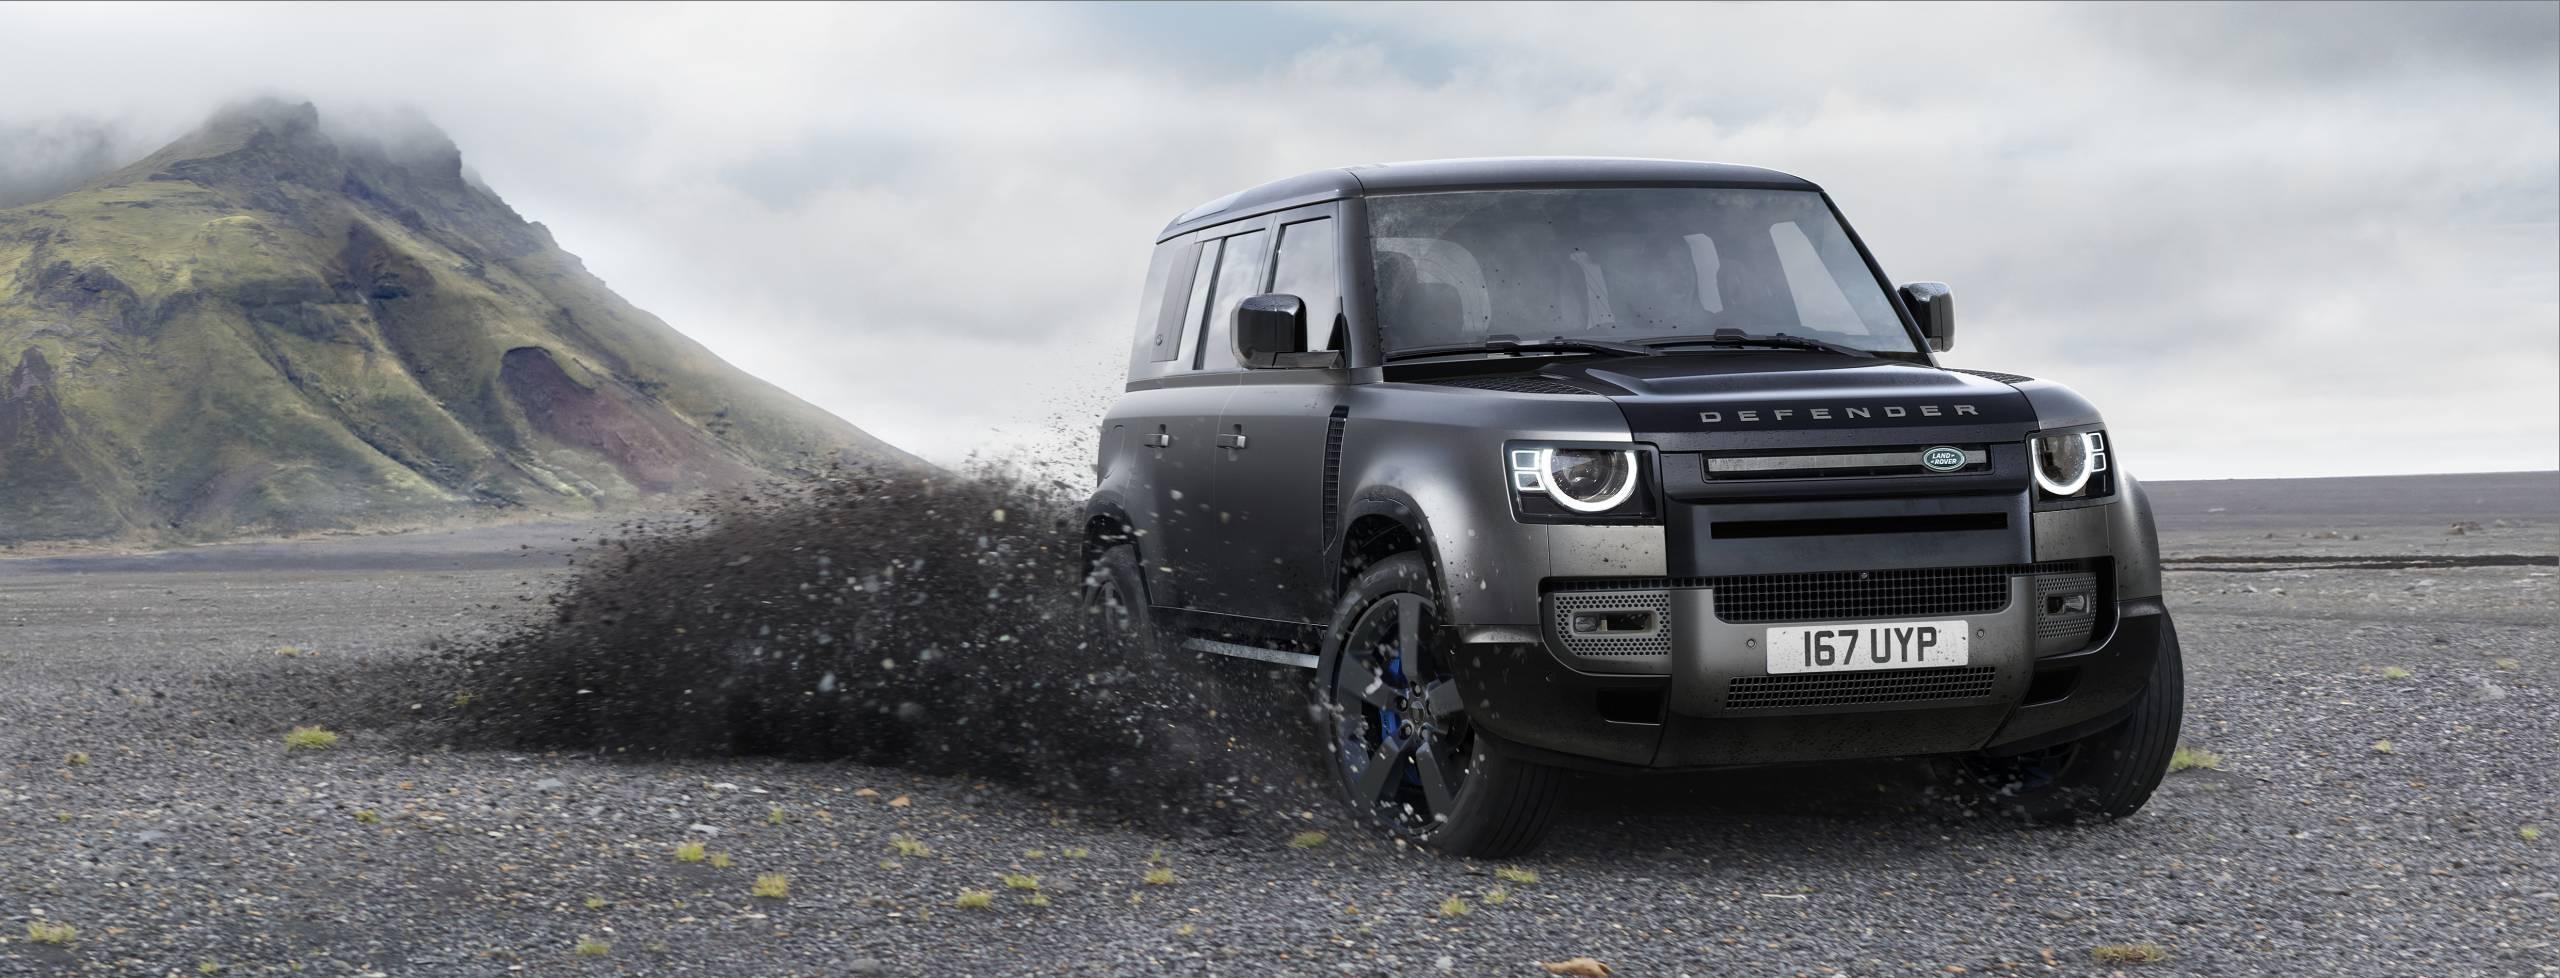 2022 Land Rover Defender 110 V8 Carpathian Edition sliding in gravel